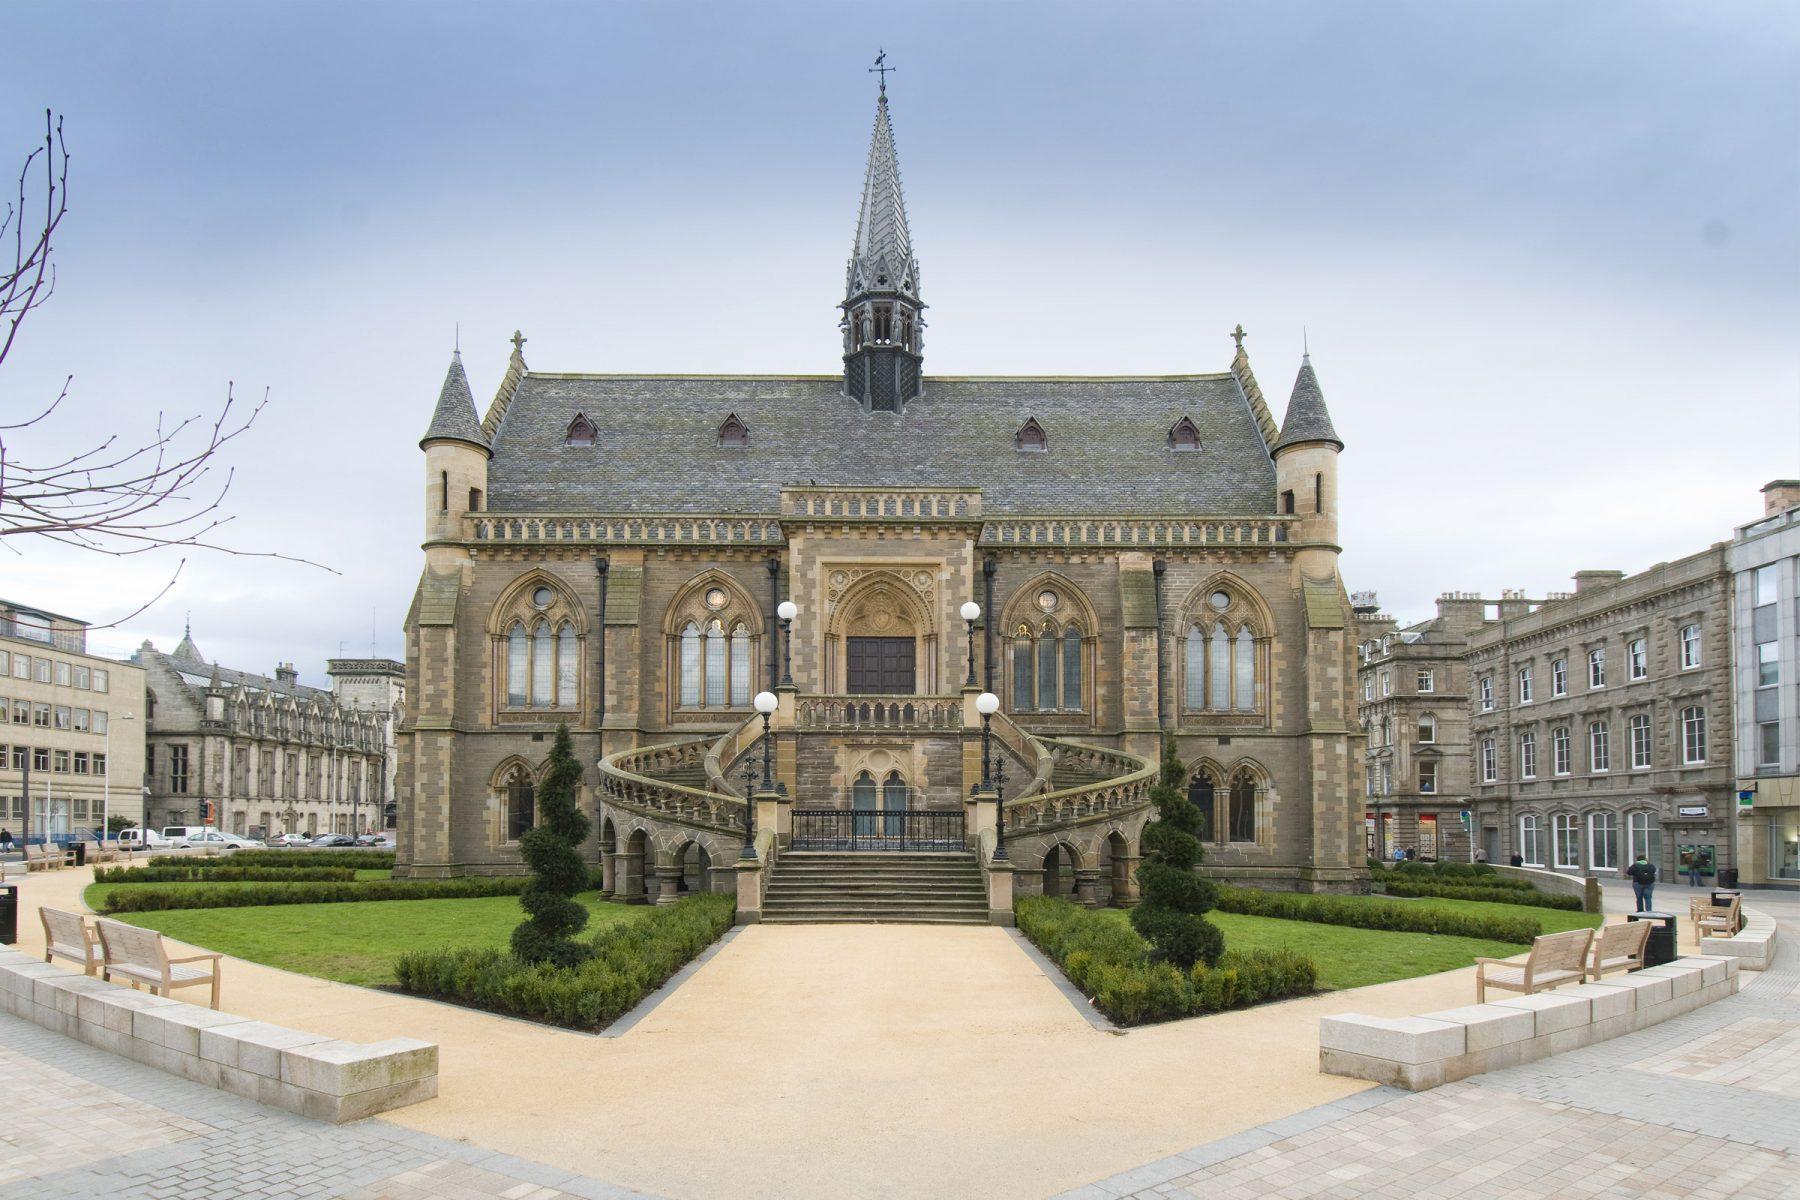 The McManus & Albert Square, Dundee